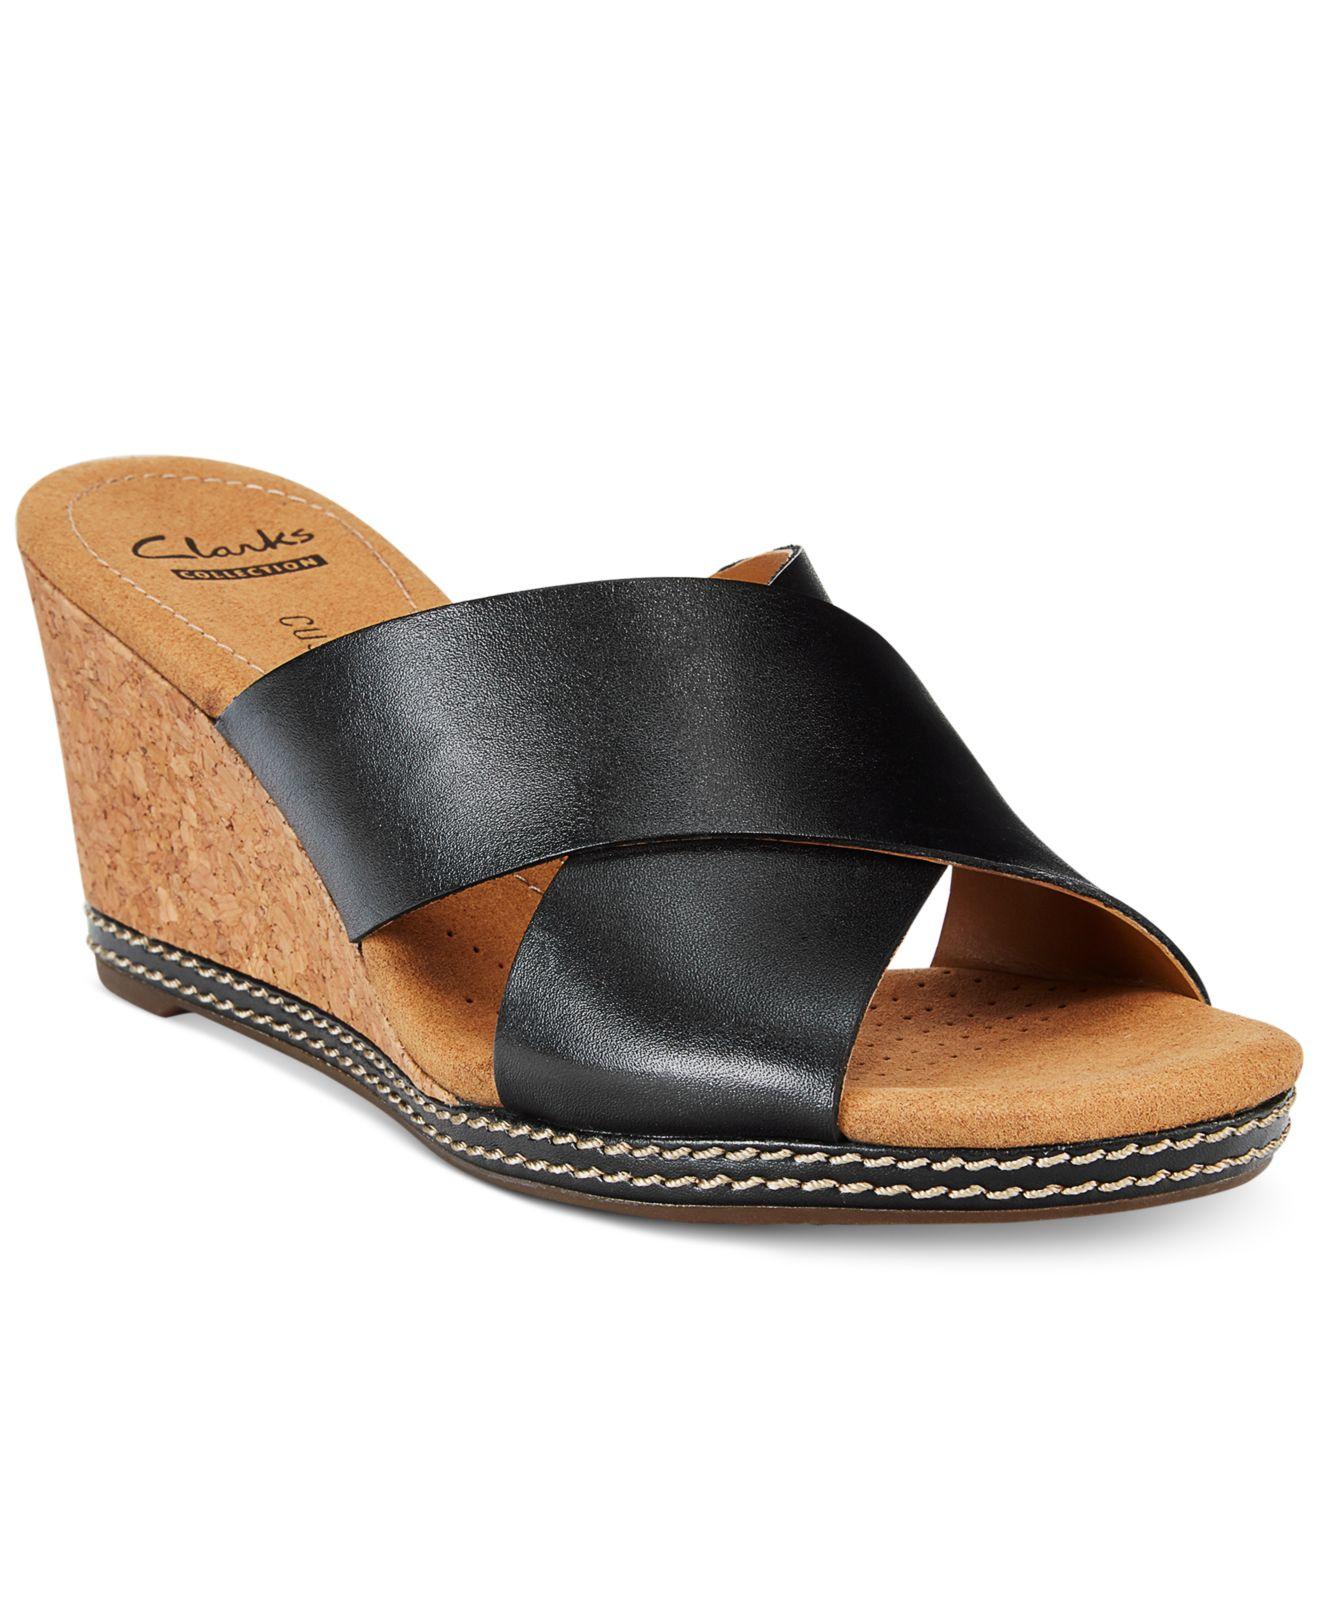 Elegant  Womens Shoes  Sandals  Wedge Sandals  Clarks Womens Wedge